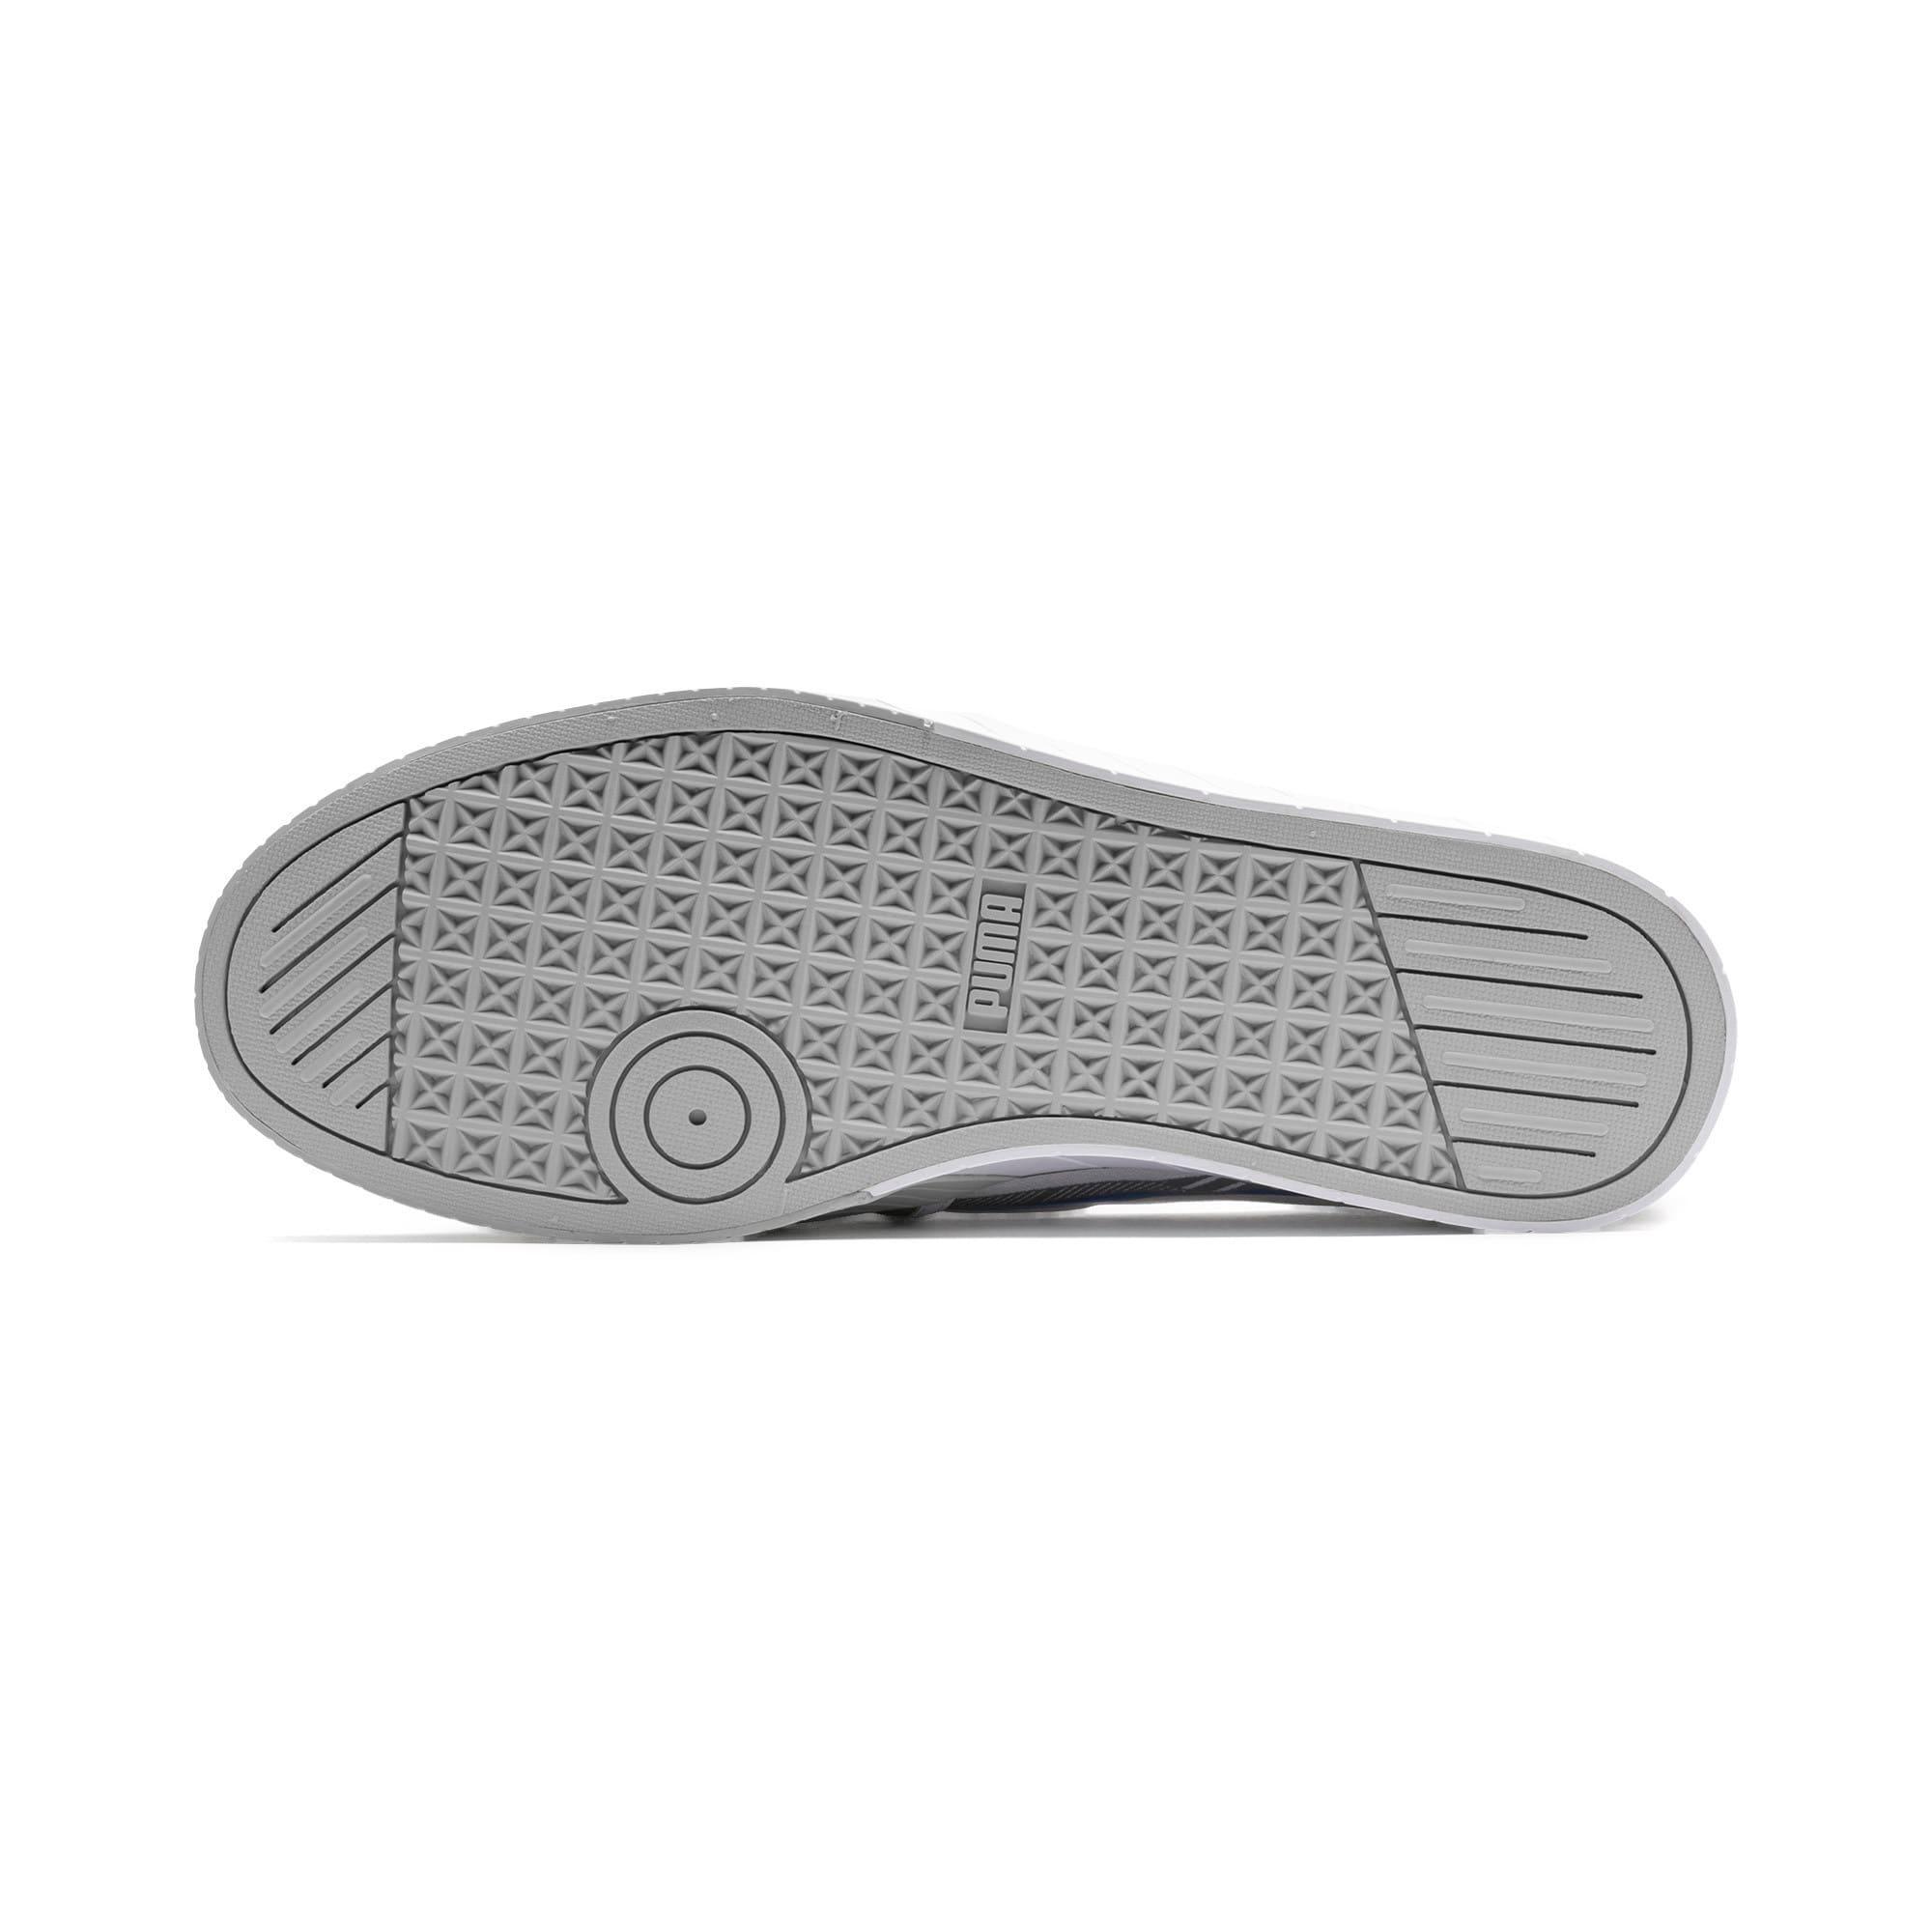 Thumbnail 5 of BMW M Motorsport Slip-On Gradient Track Shoes, Puma White-Gray Violet, medium